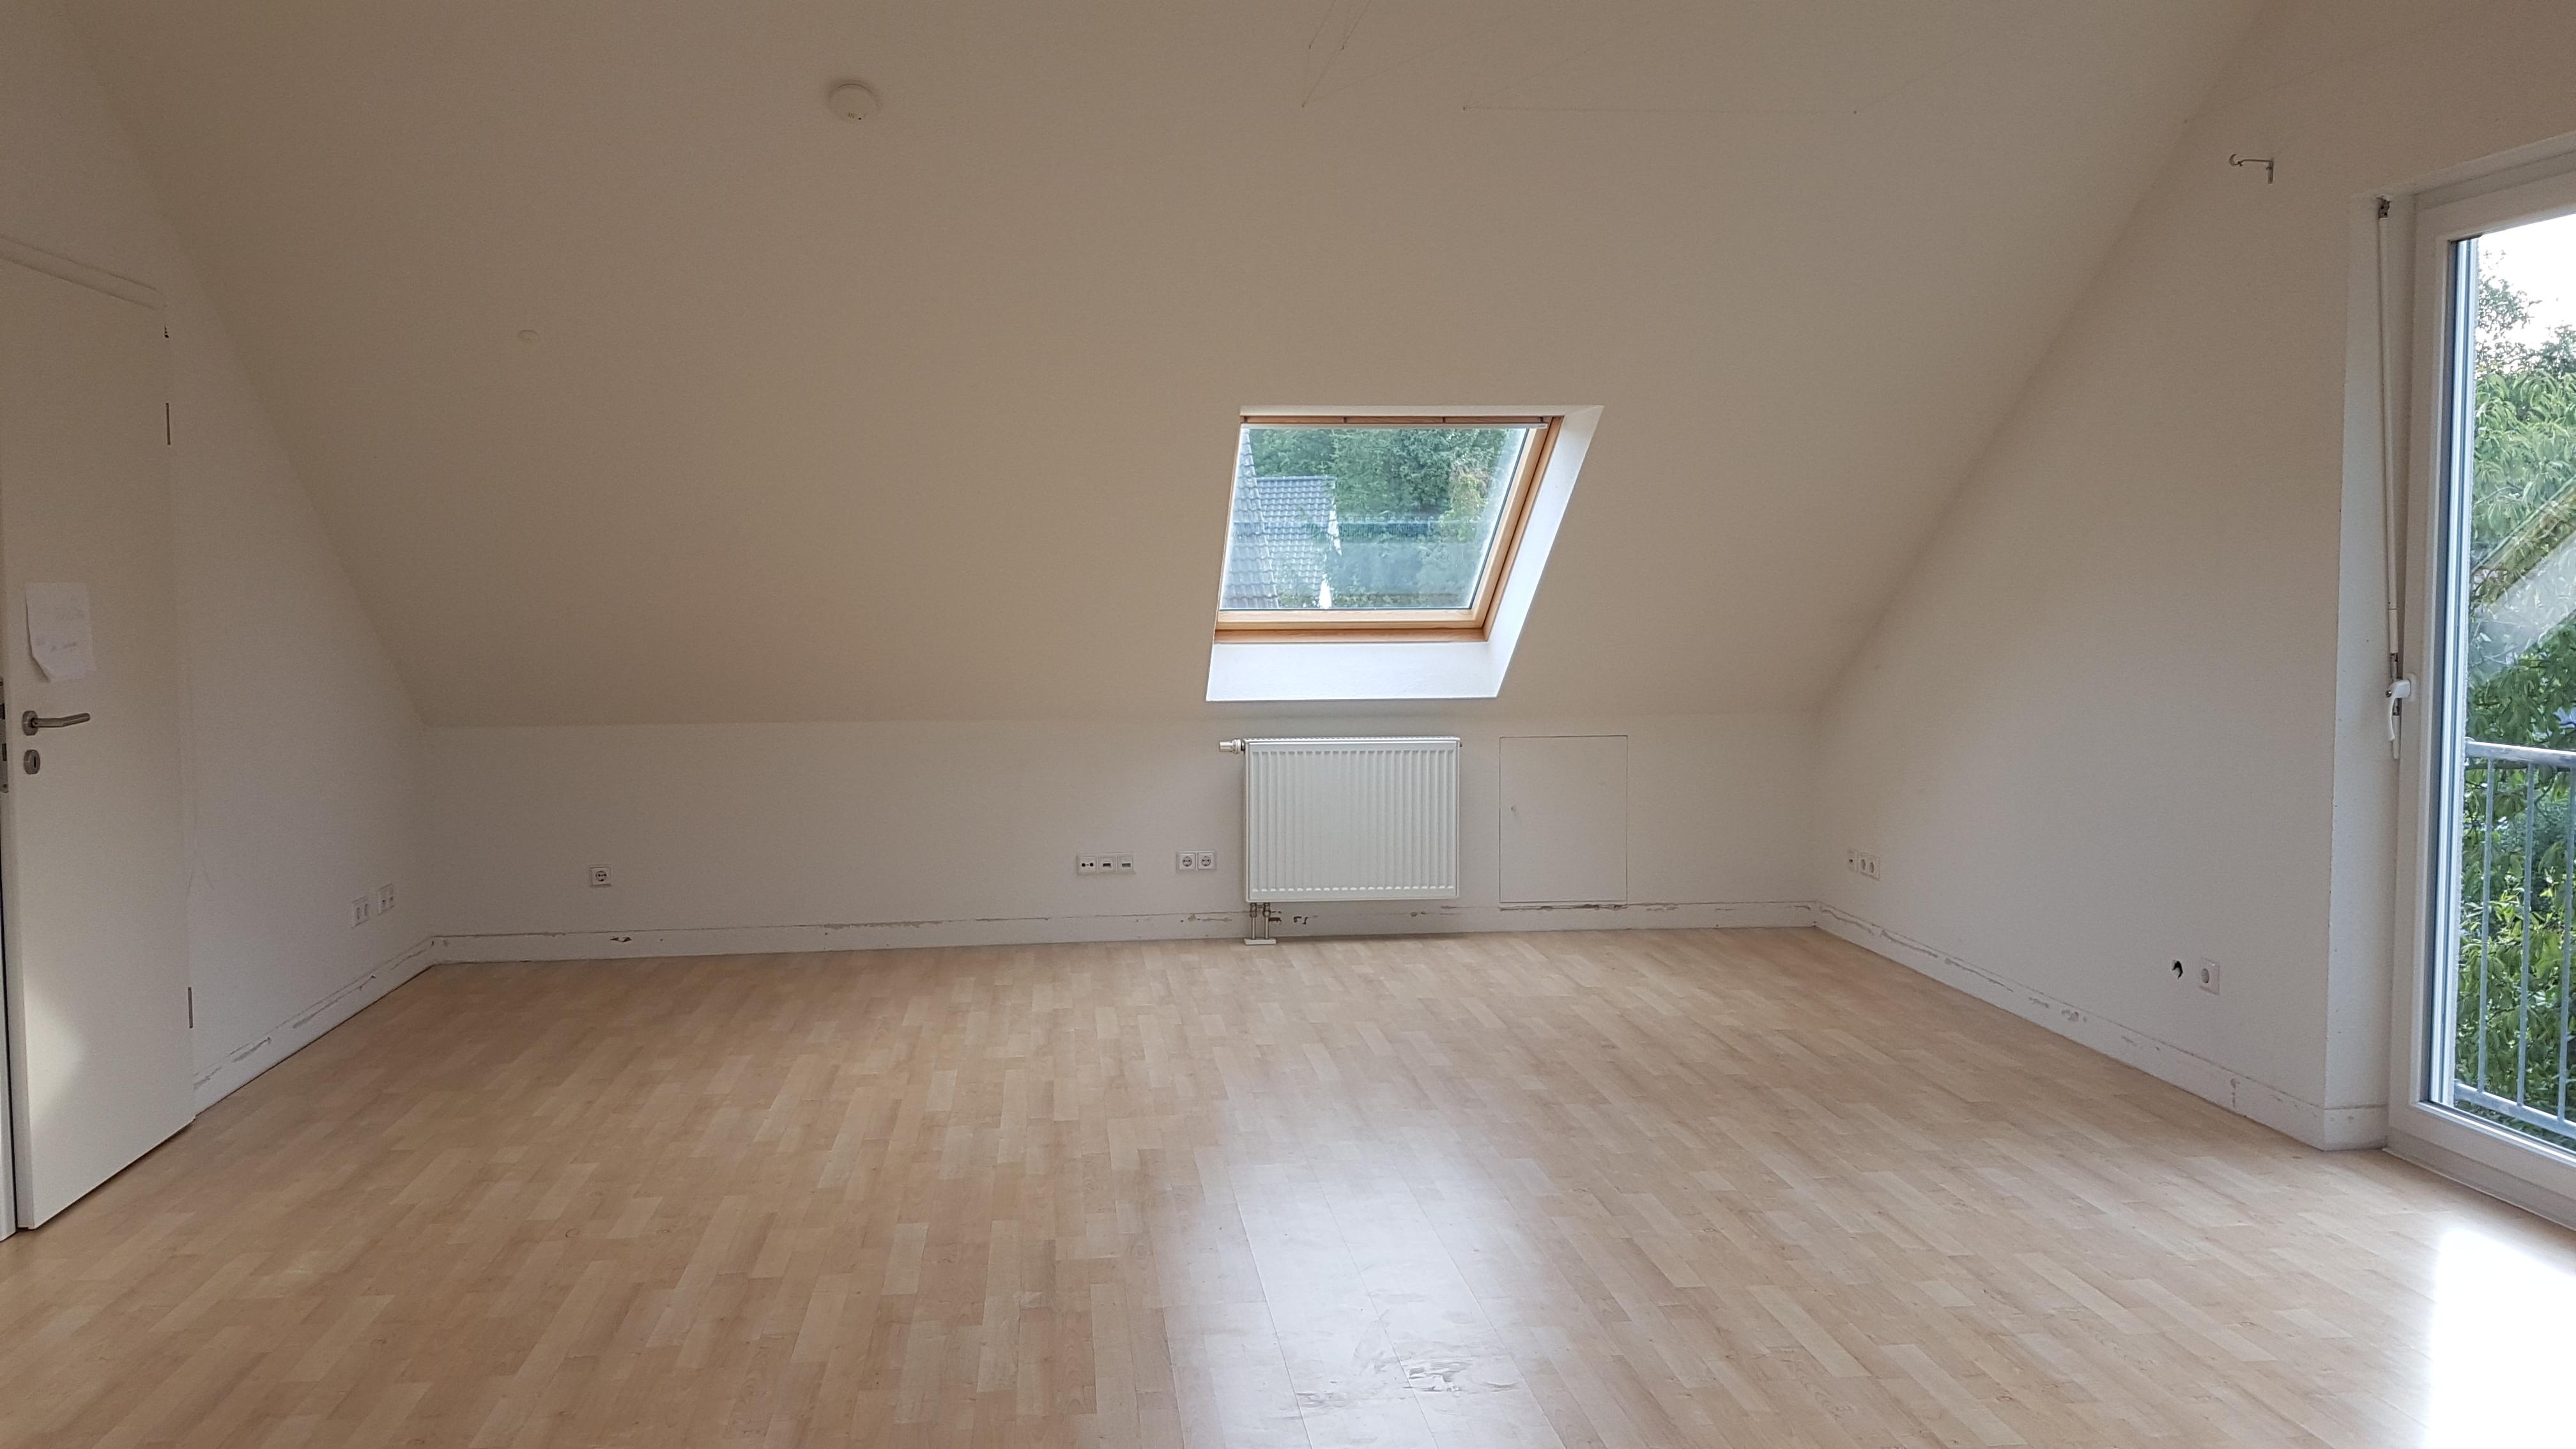 ca 34 qm laminat kanad ahorn k nigsahorn schiffsboden gebraucht sehr guter zustand g nstig. Black Bedroom Furniture Sets. Home Design Ideas